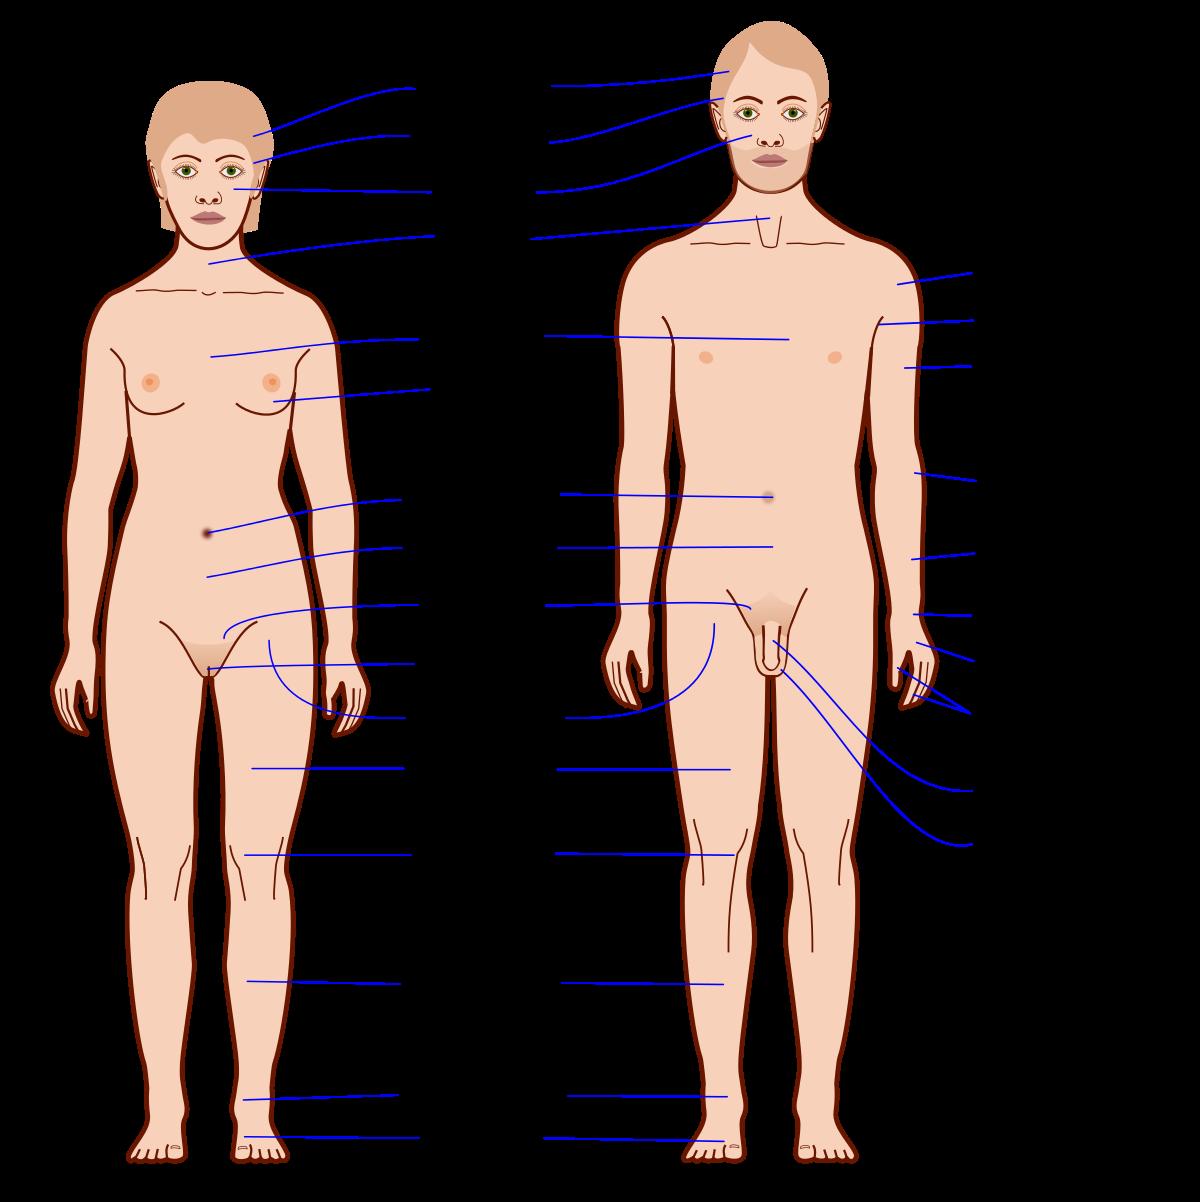 Neck clipart body part. Parts images lifeinharmony